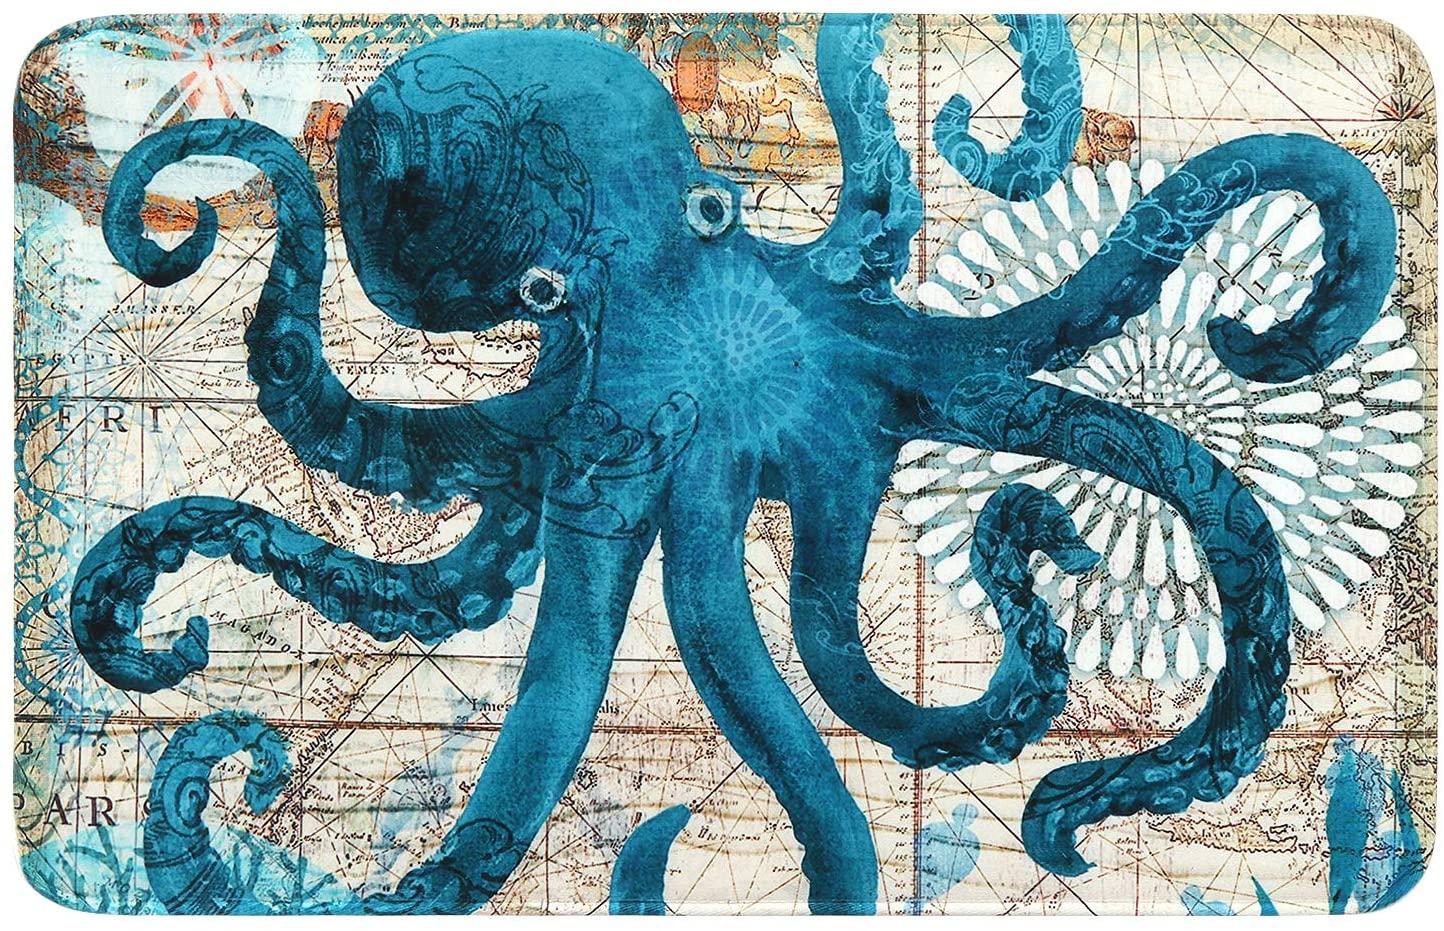 Uphome Octopus Foam Bath Mat Sea Theme Coastal Navigation Map Blue Bathroom Rugs Non-Slip Flannel Floor Bath Rug,Summer Ocean Life Bathroom Decorations,20x31